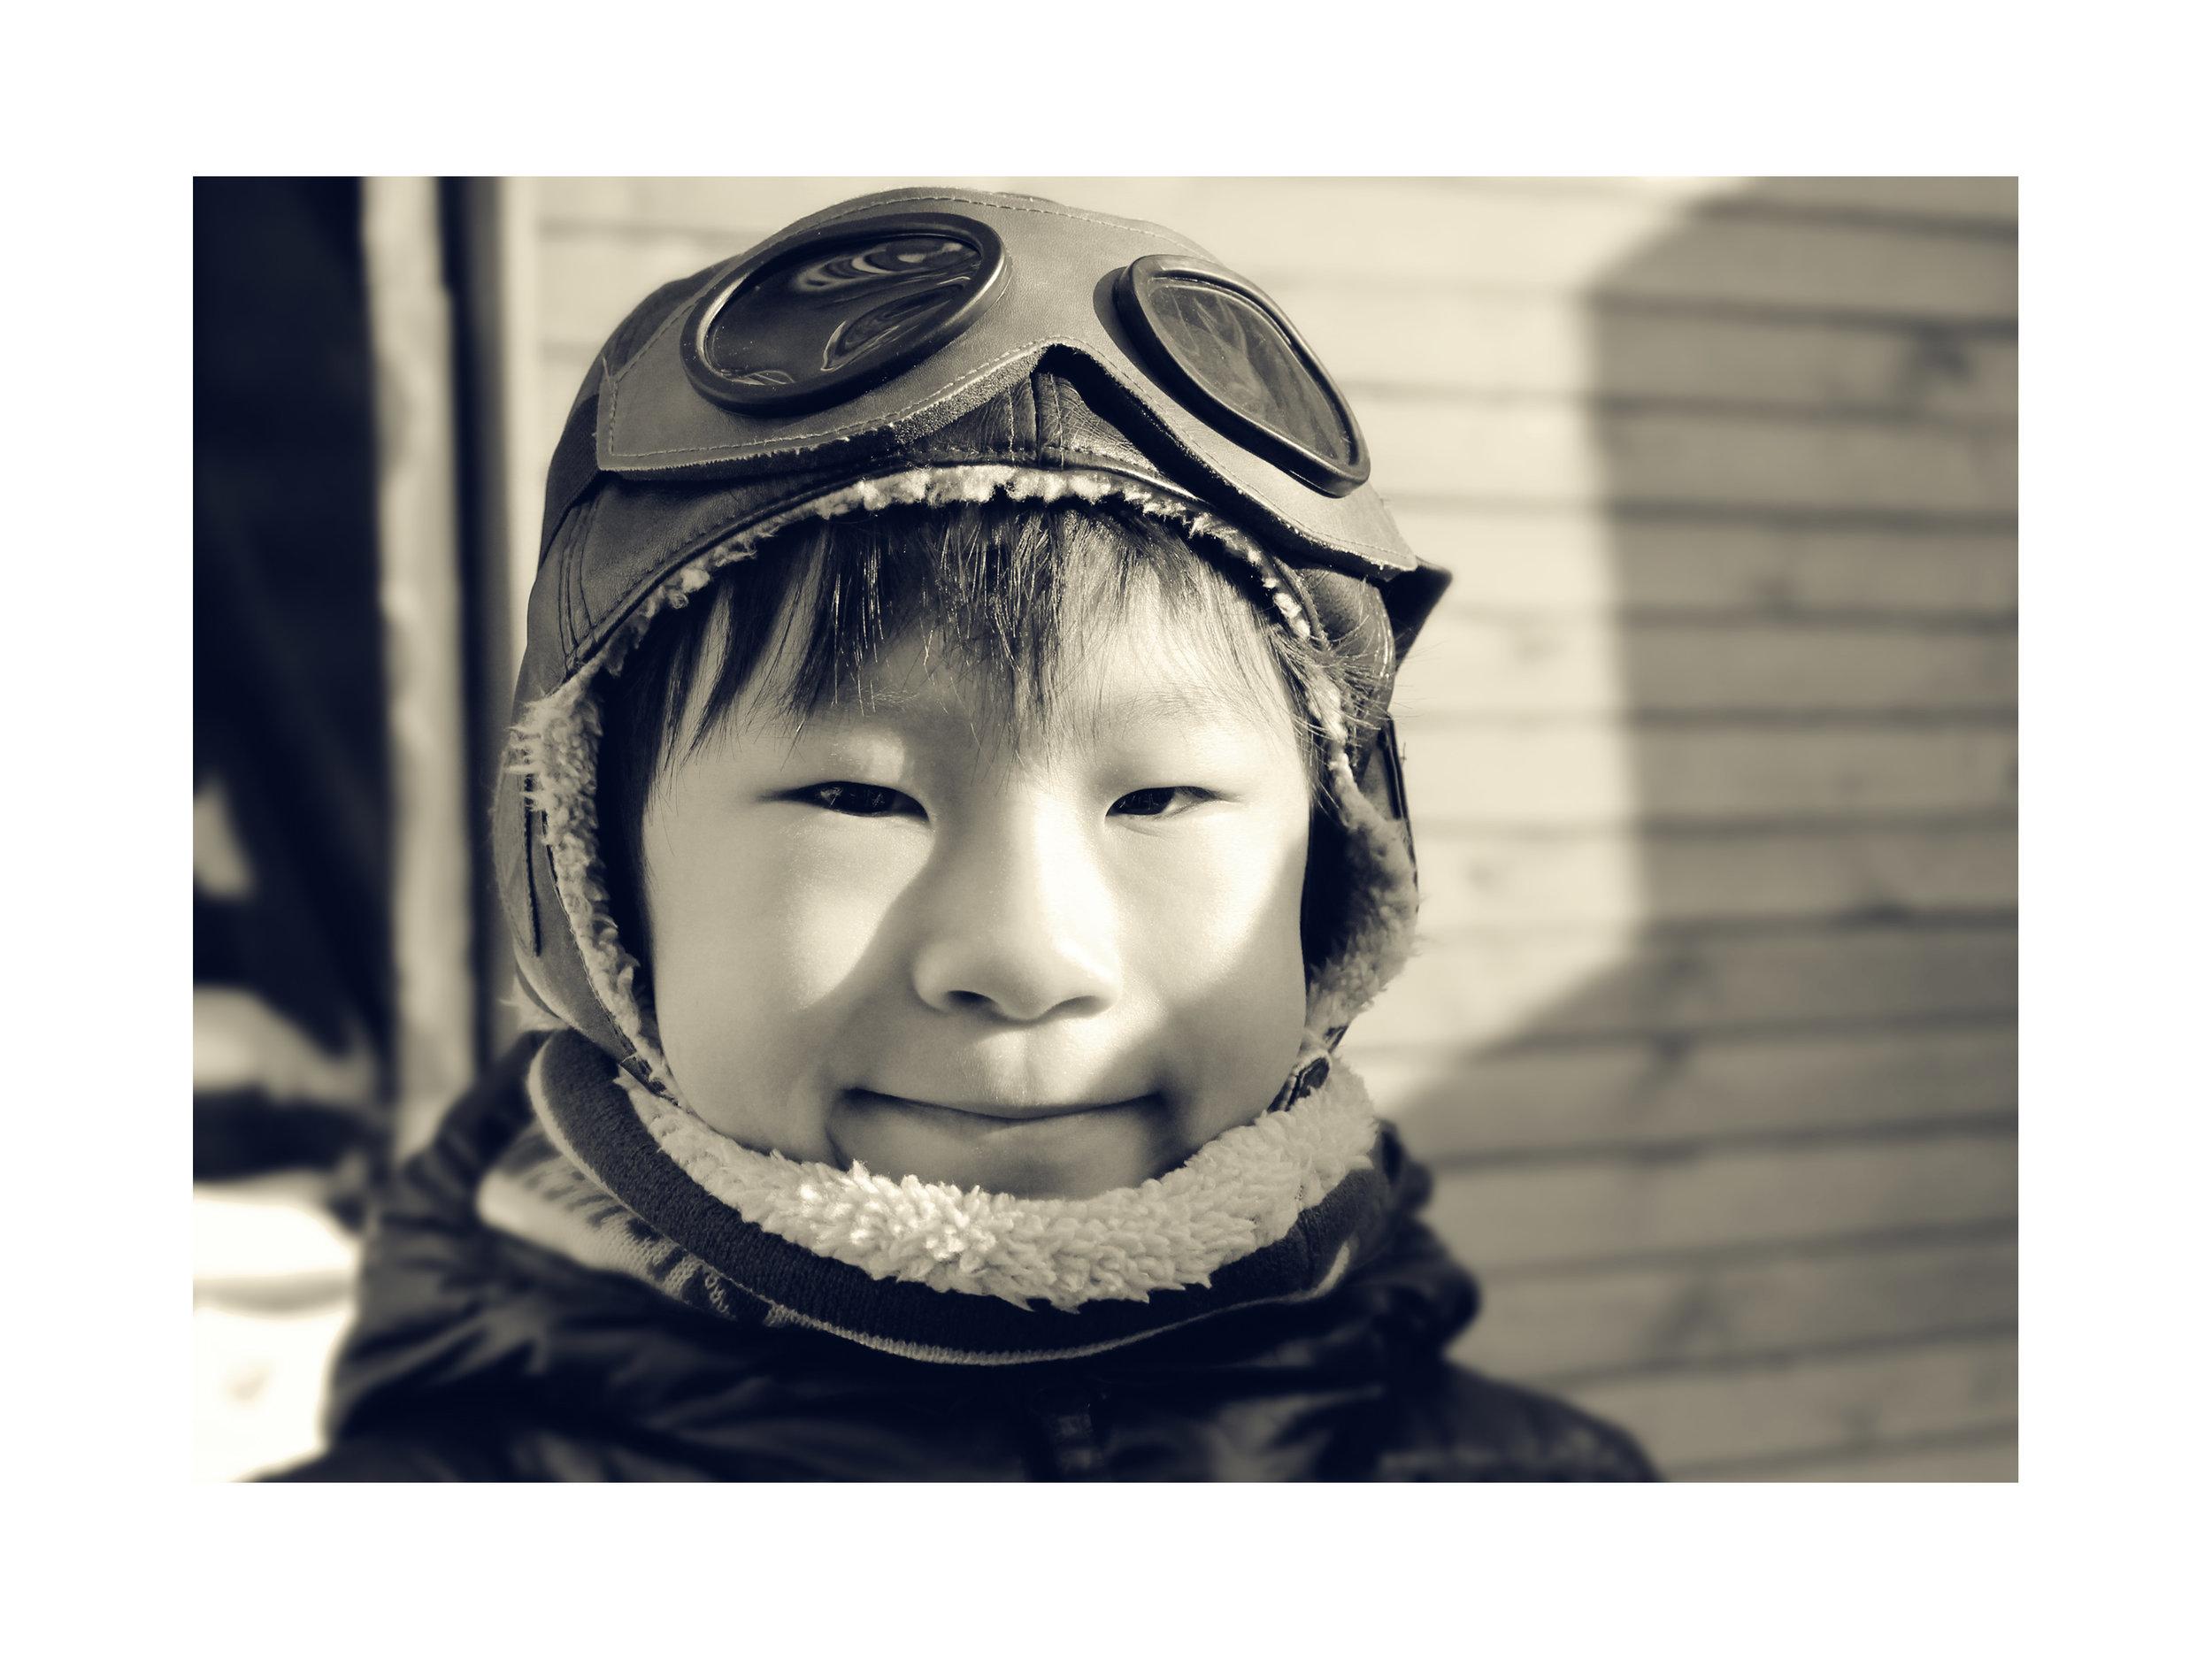 JW_face VI_017.jpg